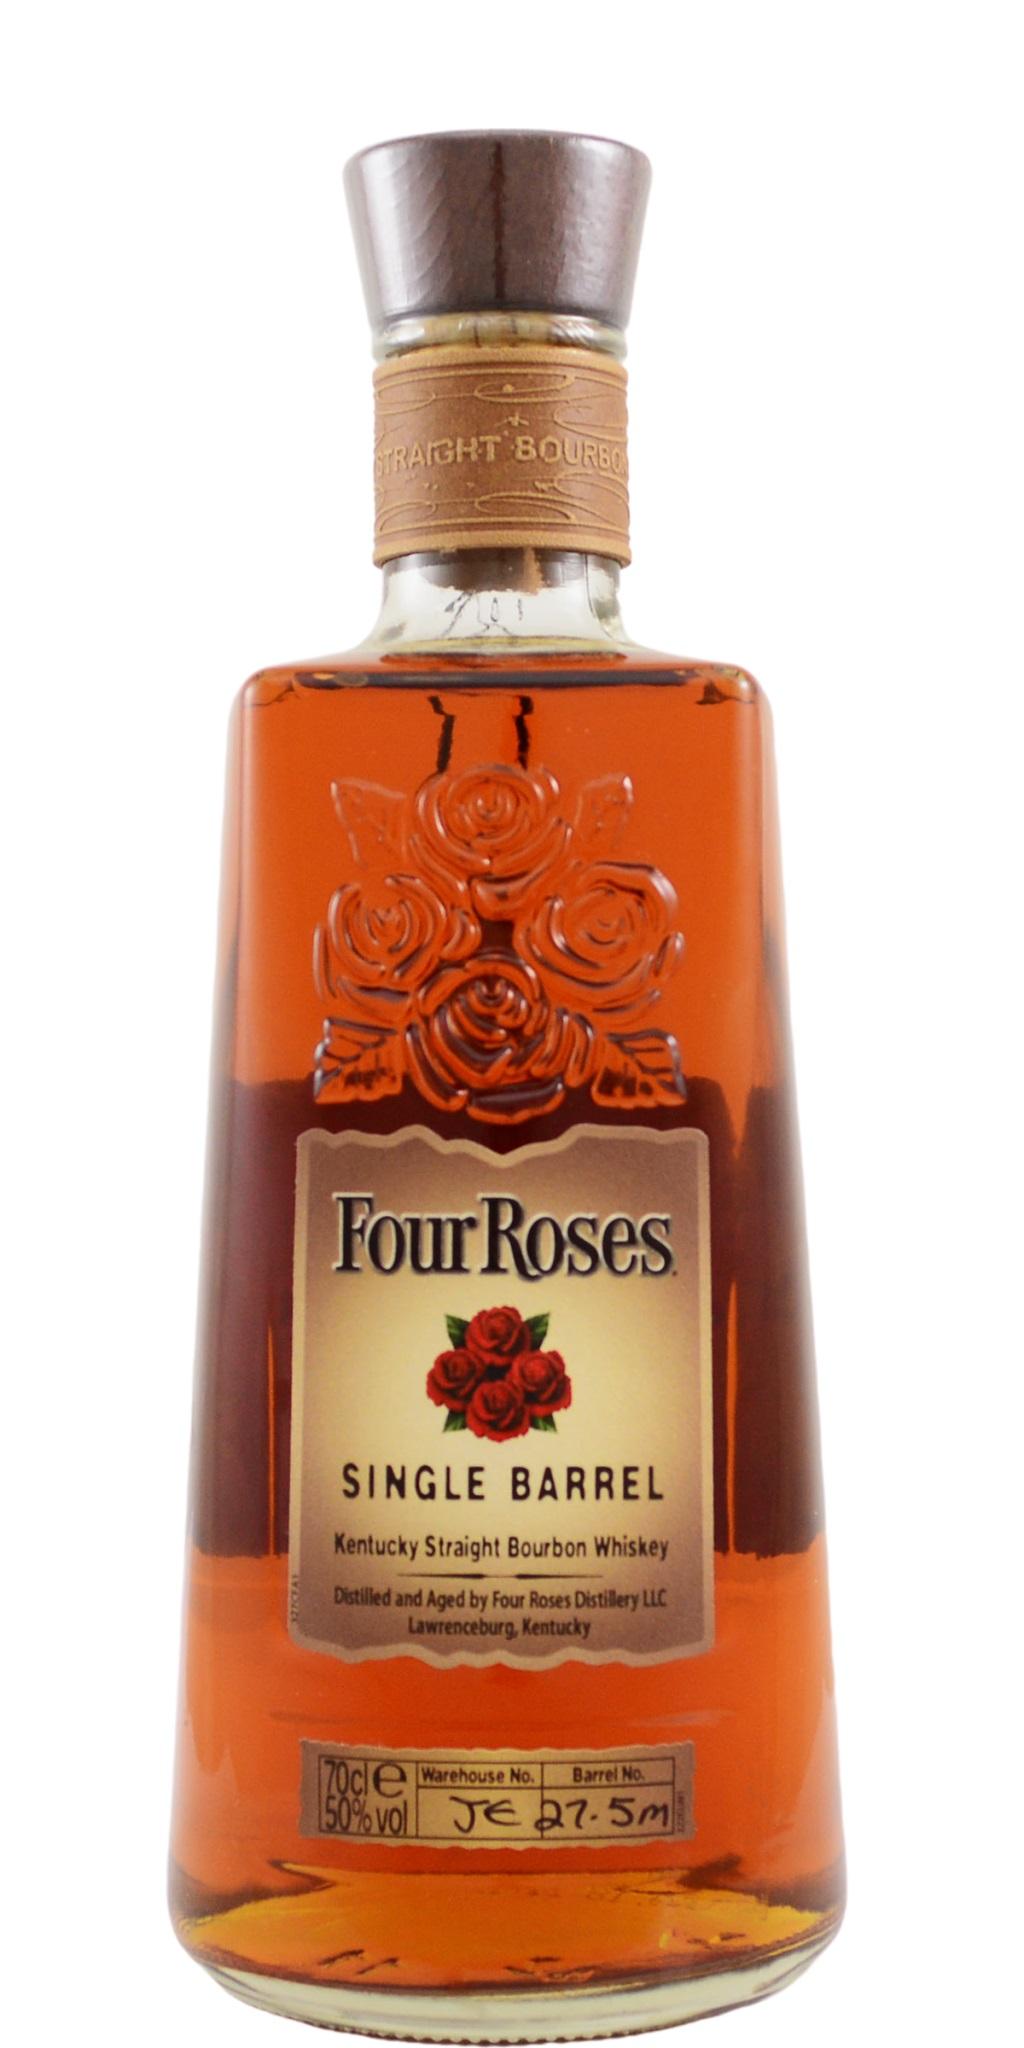 Single Barrel Straight Bourbon